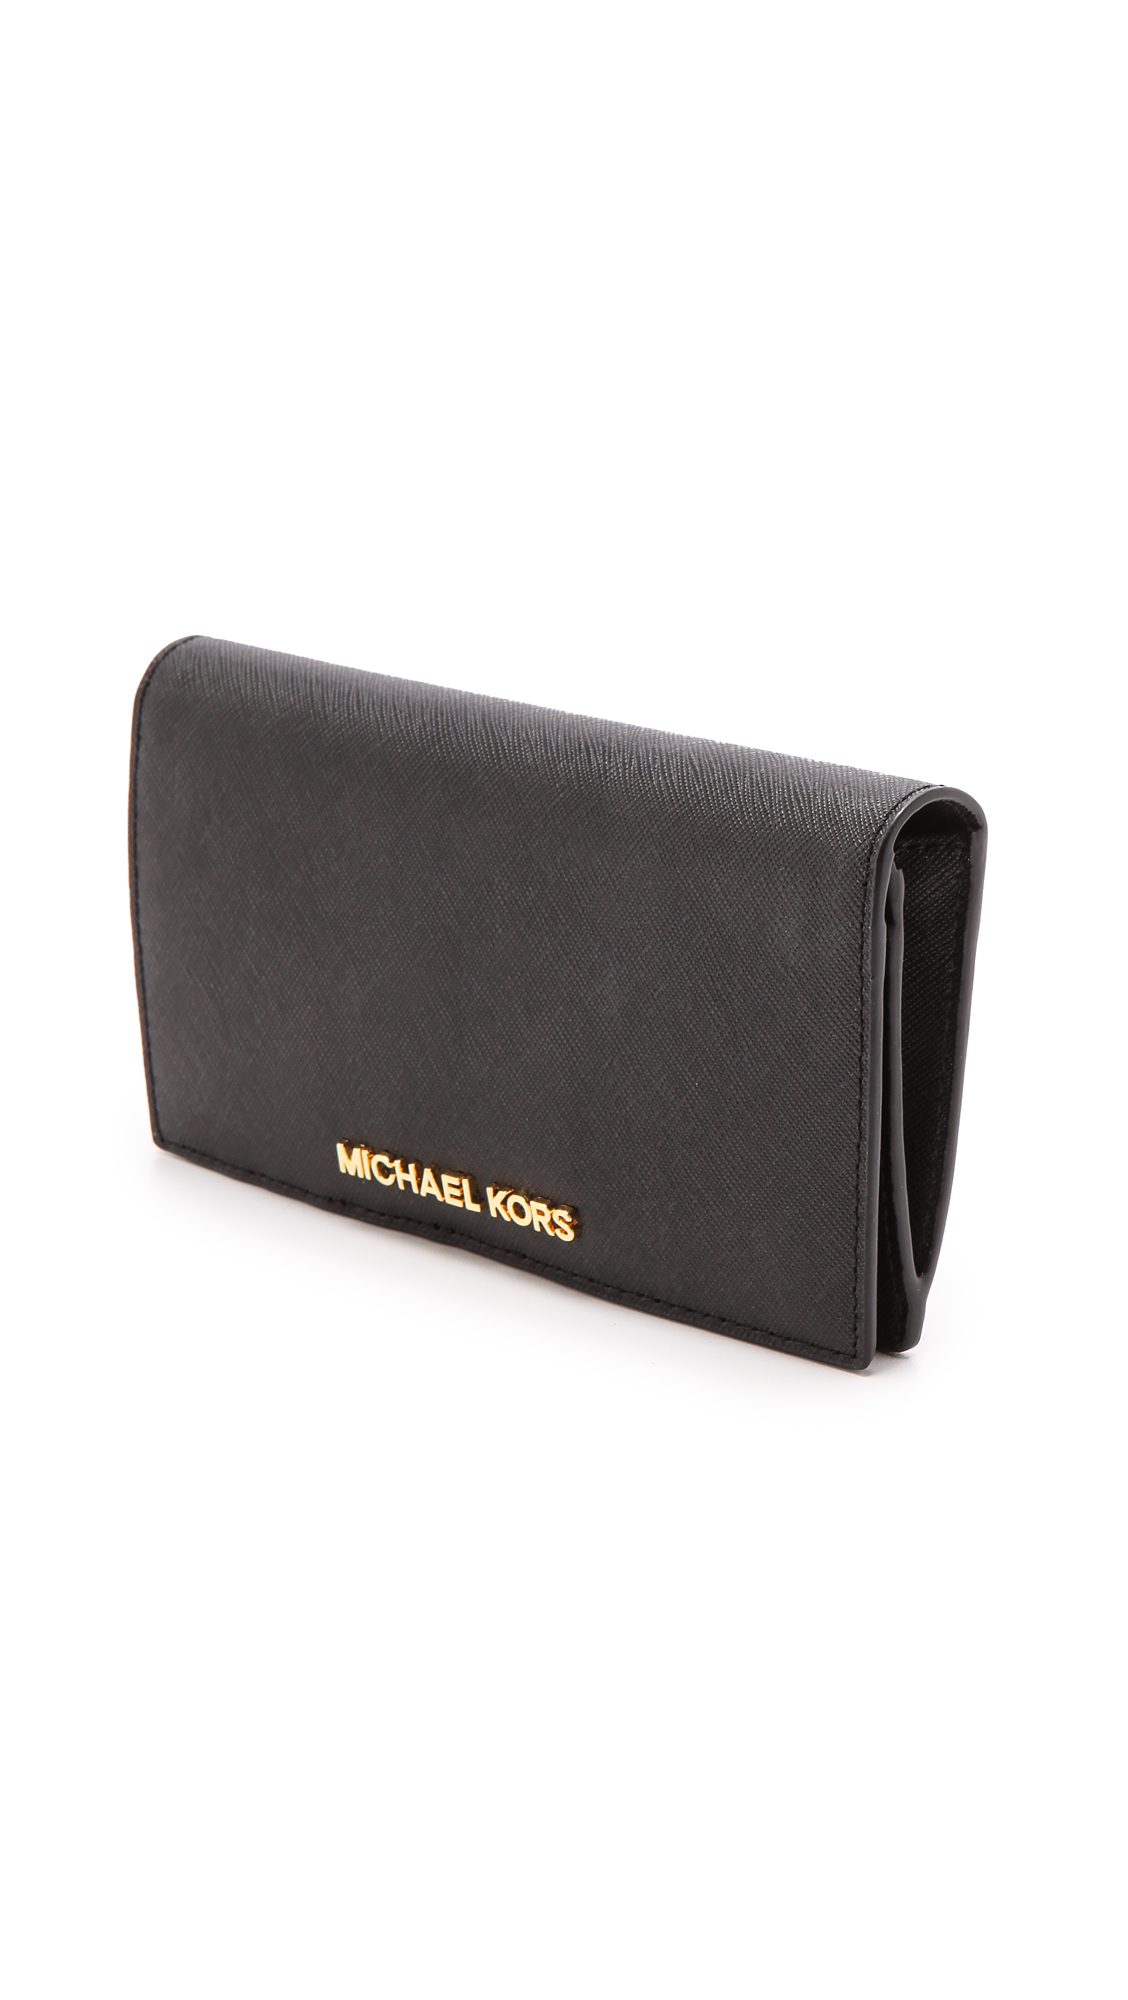 7d4211457082 MICHAEL Michael Kors Jet Set Travel Large Slim Wallet in Black - Lyst